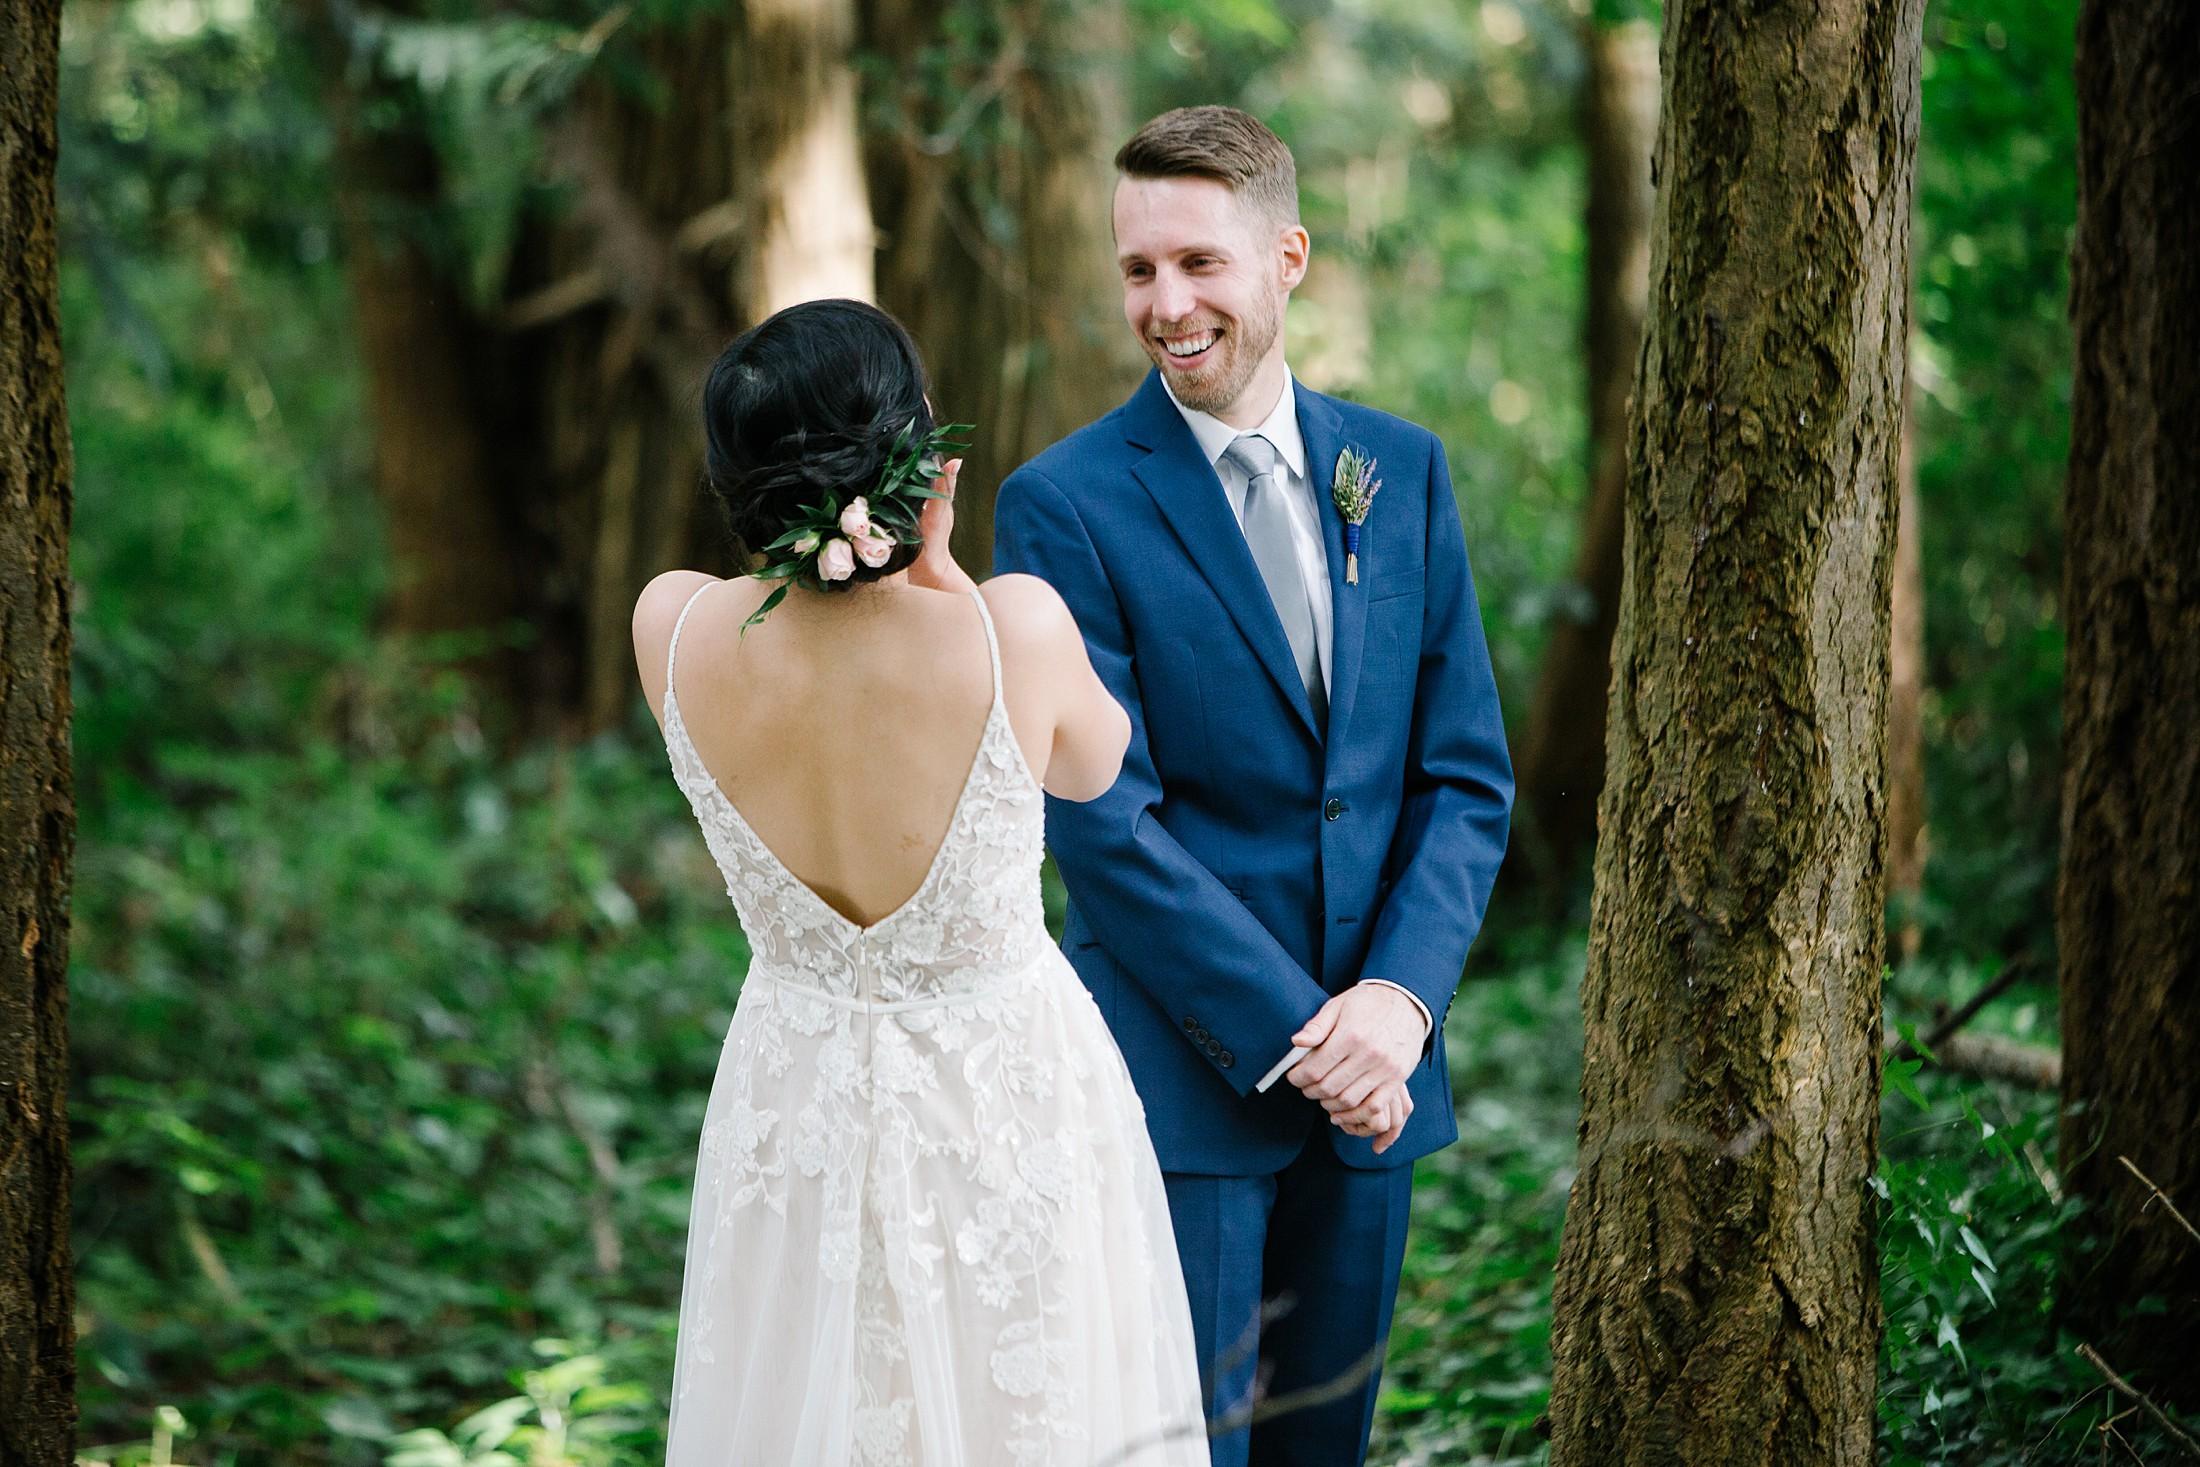 May26.TiffanyandSpencer5055_Note Photography Documentary Photographer Wedding Photos Vancouver B.C. Best of 2018 2019 2020 Vancouver Island Okanagan Banff Edmonton Victoria.jpg